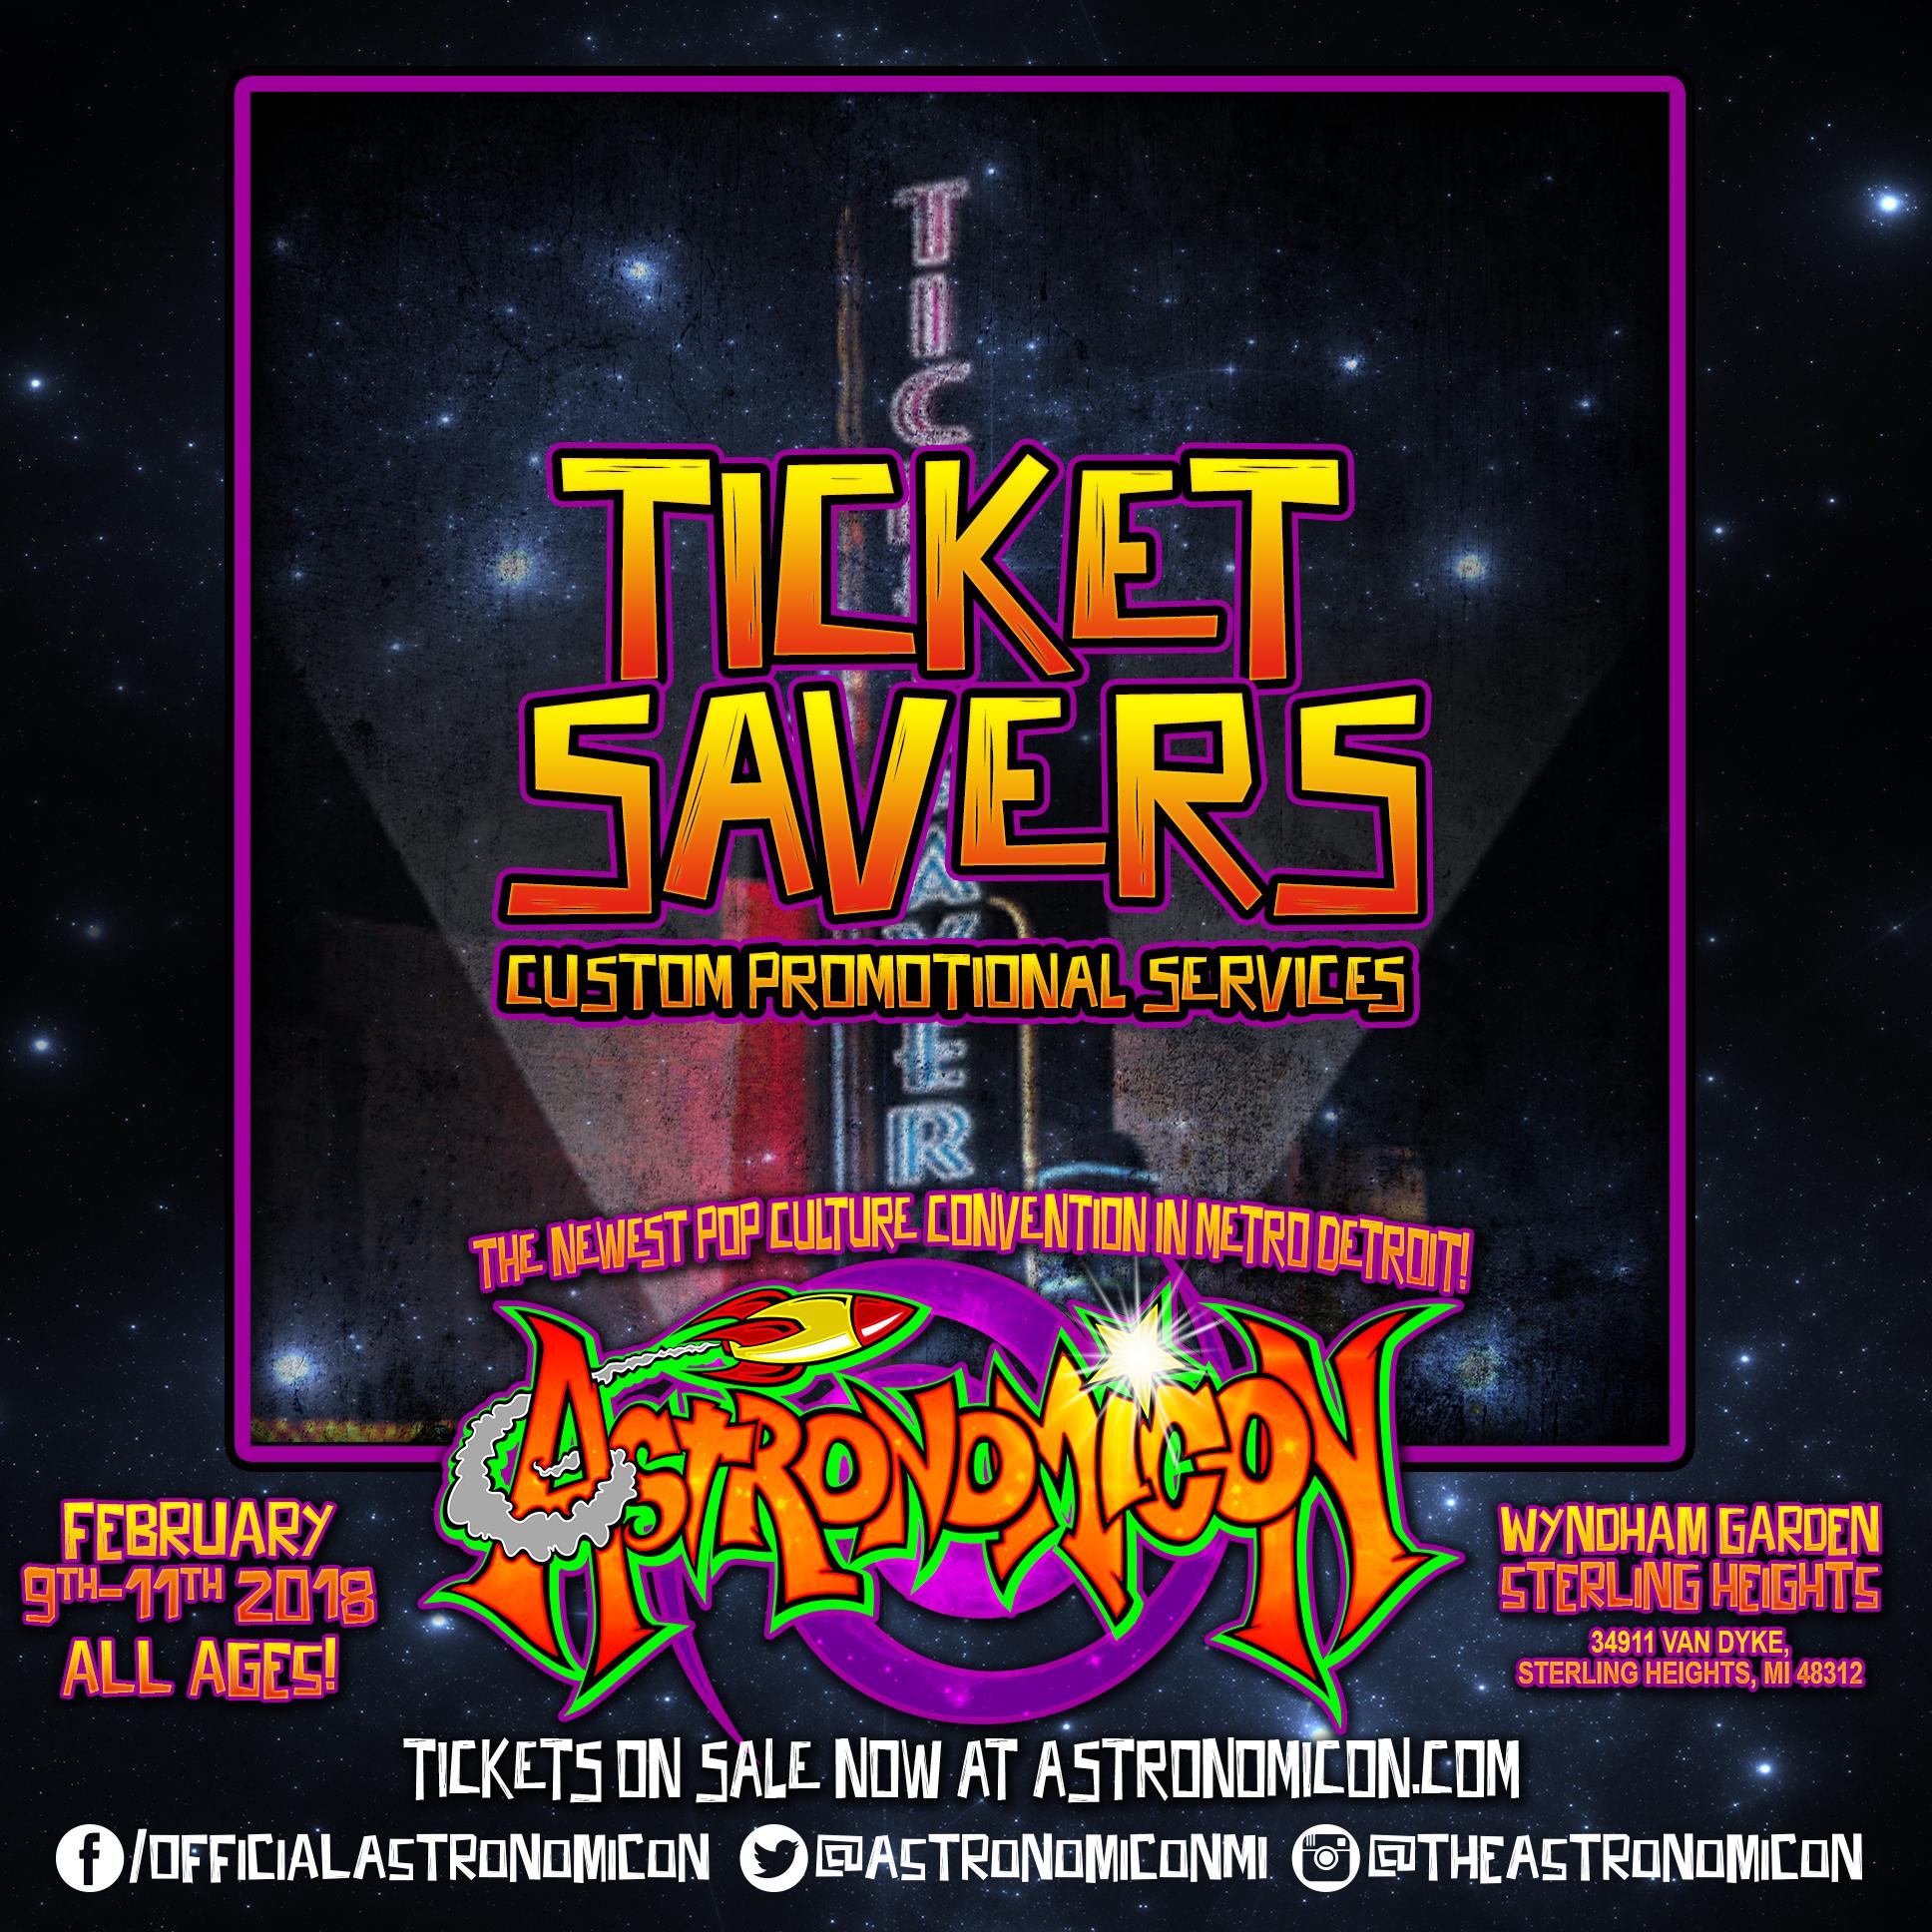 Ticket Savers -  http://www.ticket-saver.com/